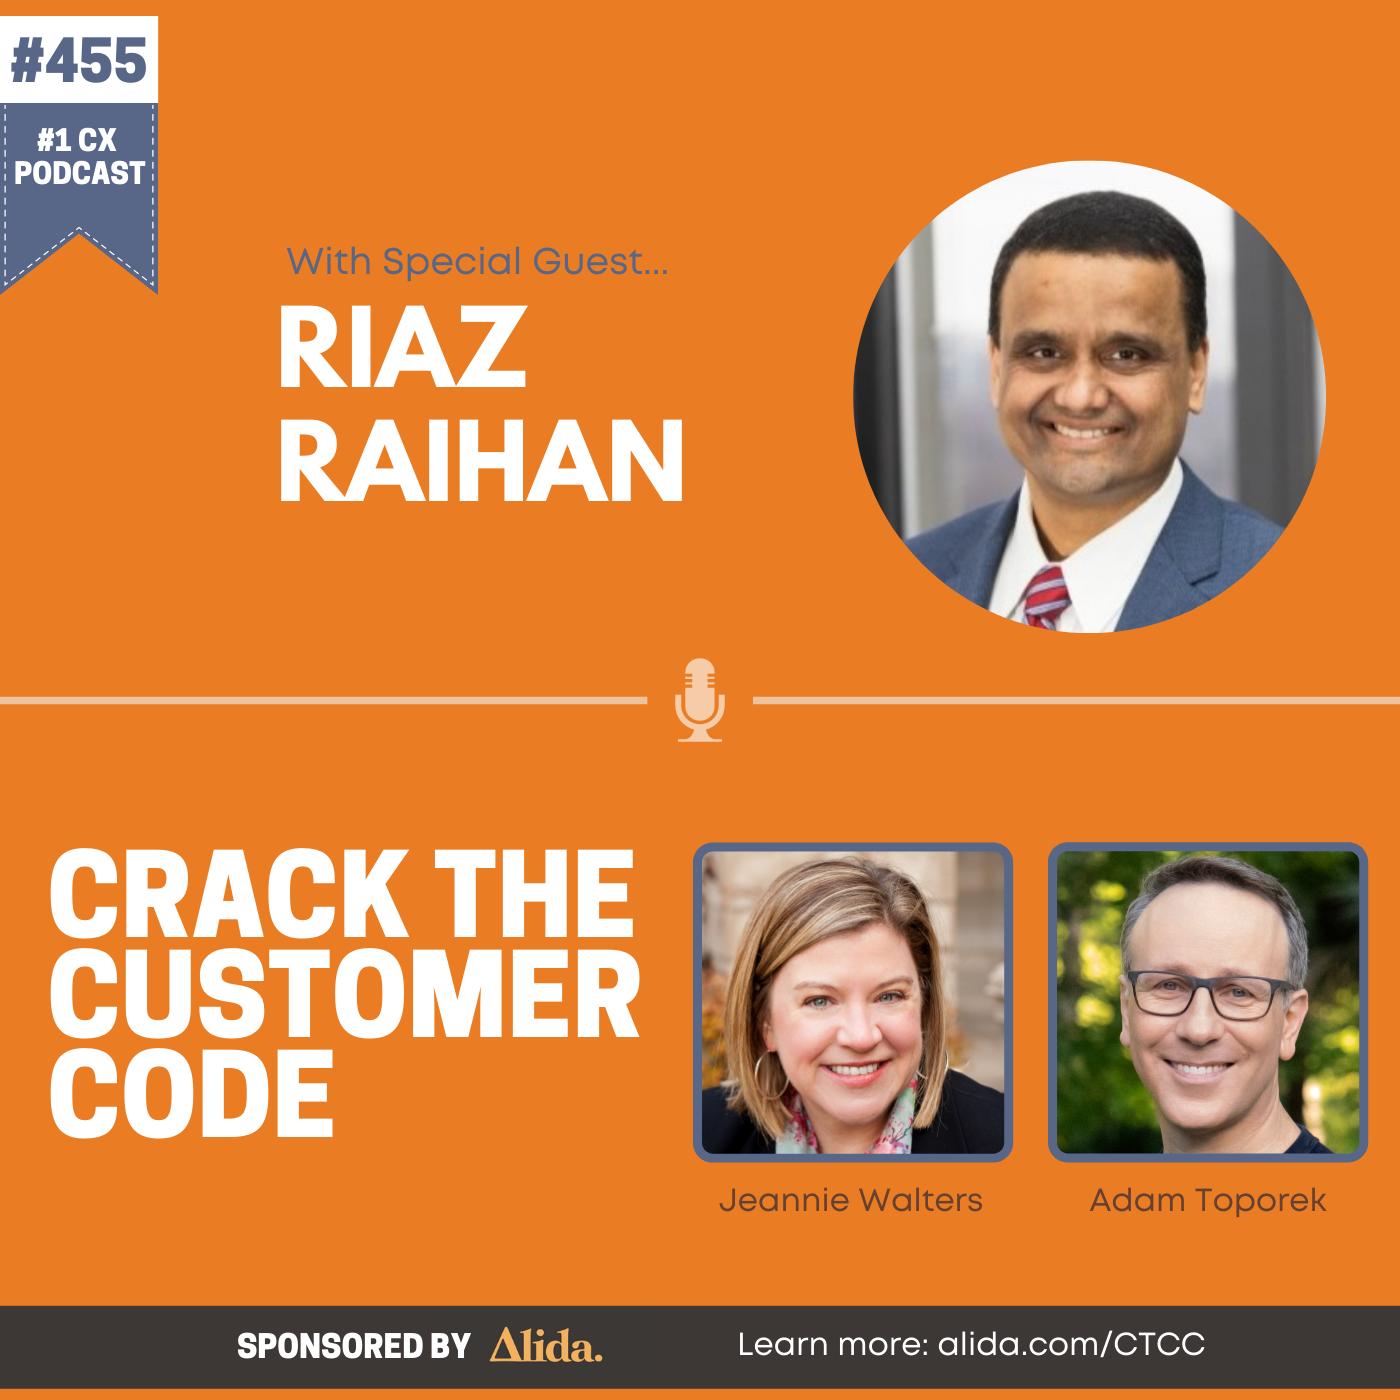 455: Riaz Raihan, Improving CX with AI